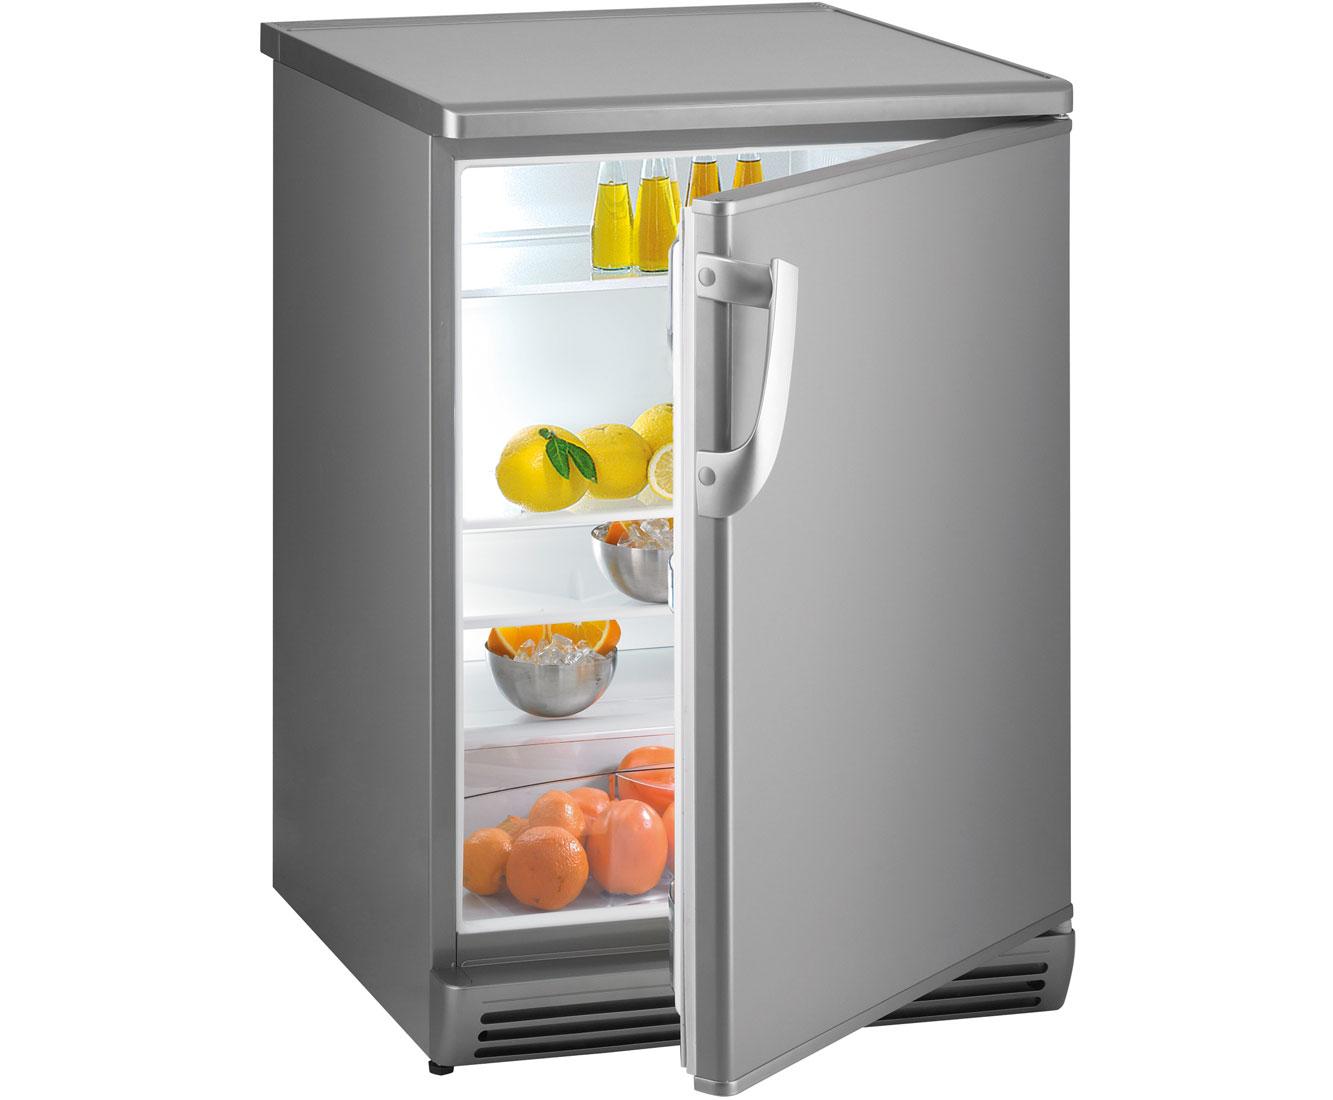 Gorenje Kühlschrank Edelstahl : Gorenje r 6093 ax kühlschrank edelstahl optik a